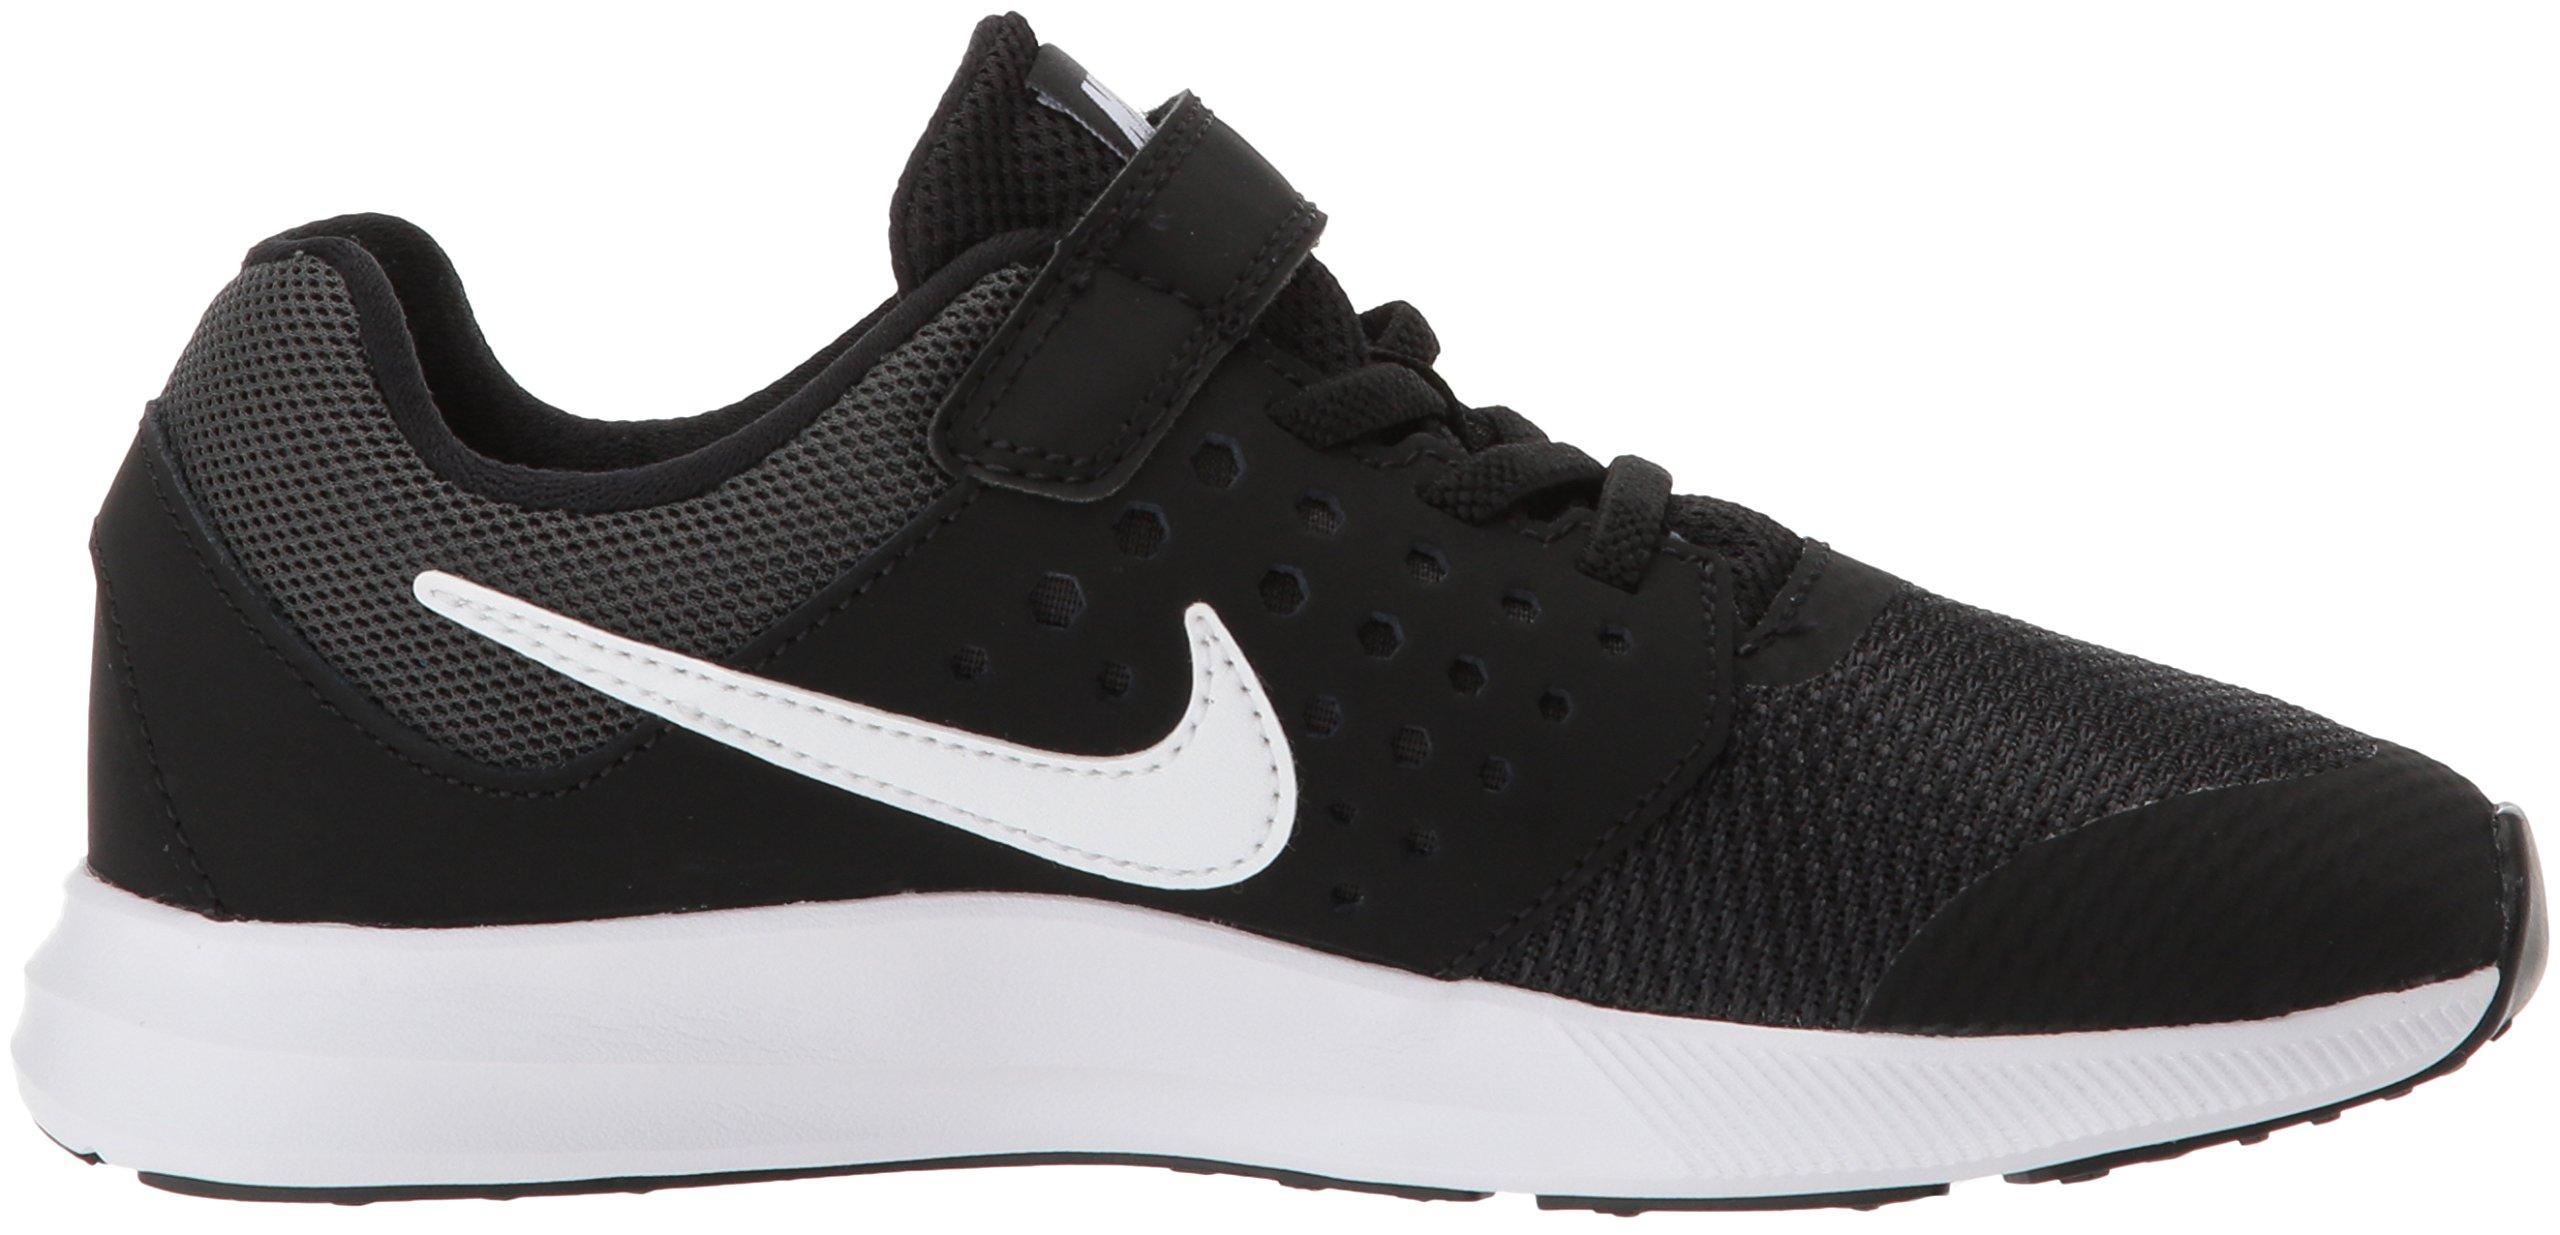 Nike Boys' Downshifter 7 (PSV) Running Shoe, Black/White-Anthracite, 3 M US Little Kid by Nike (Image #6)